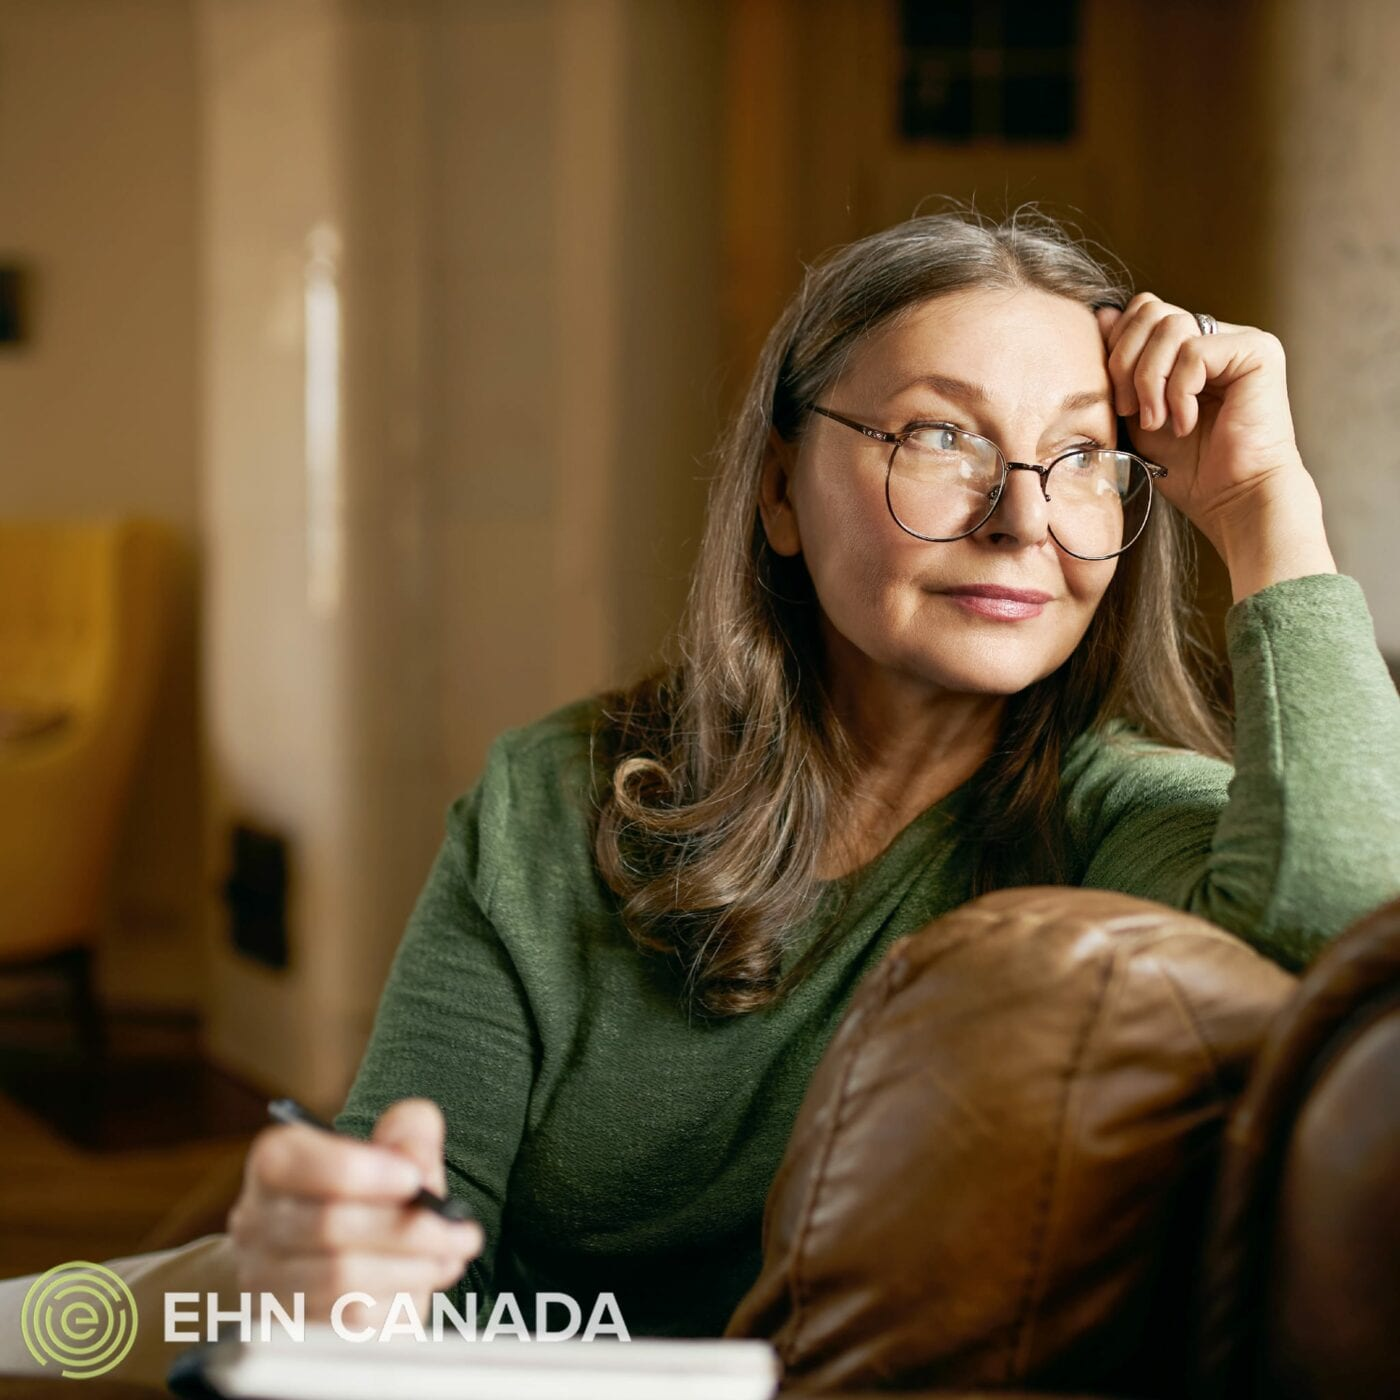 Fruma's letter kind loving addiction treatment